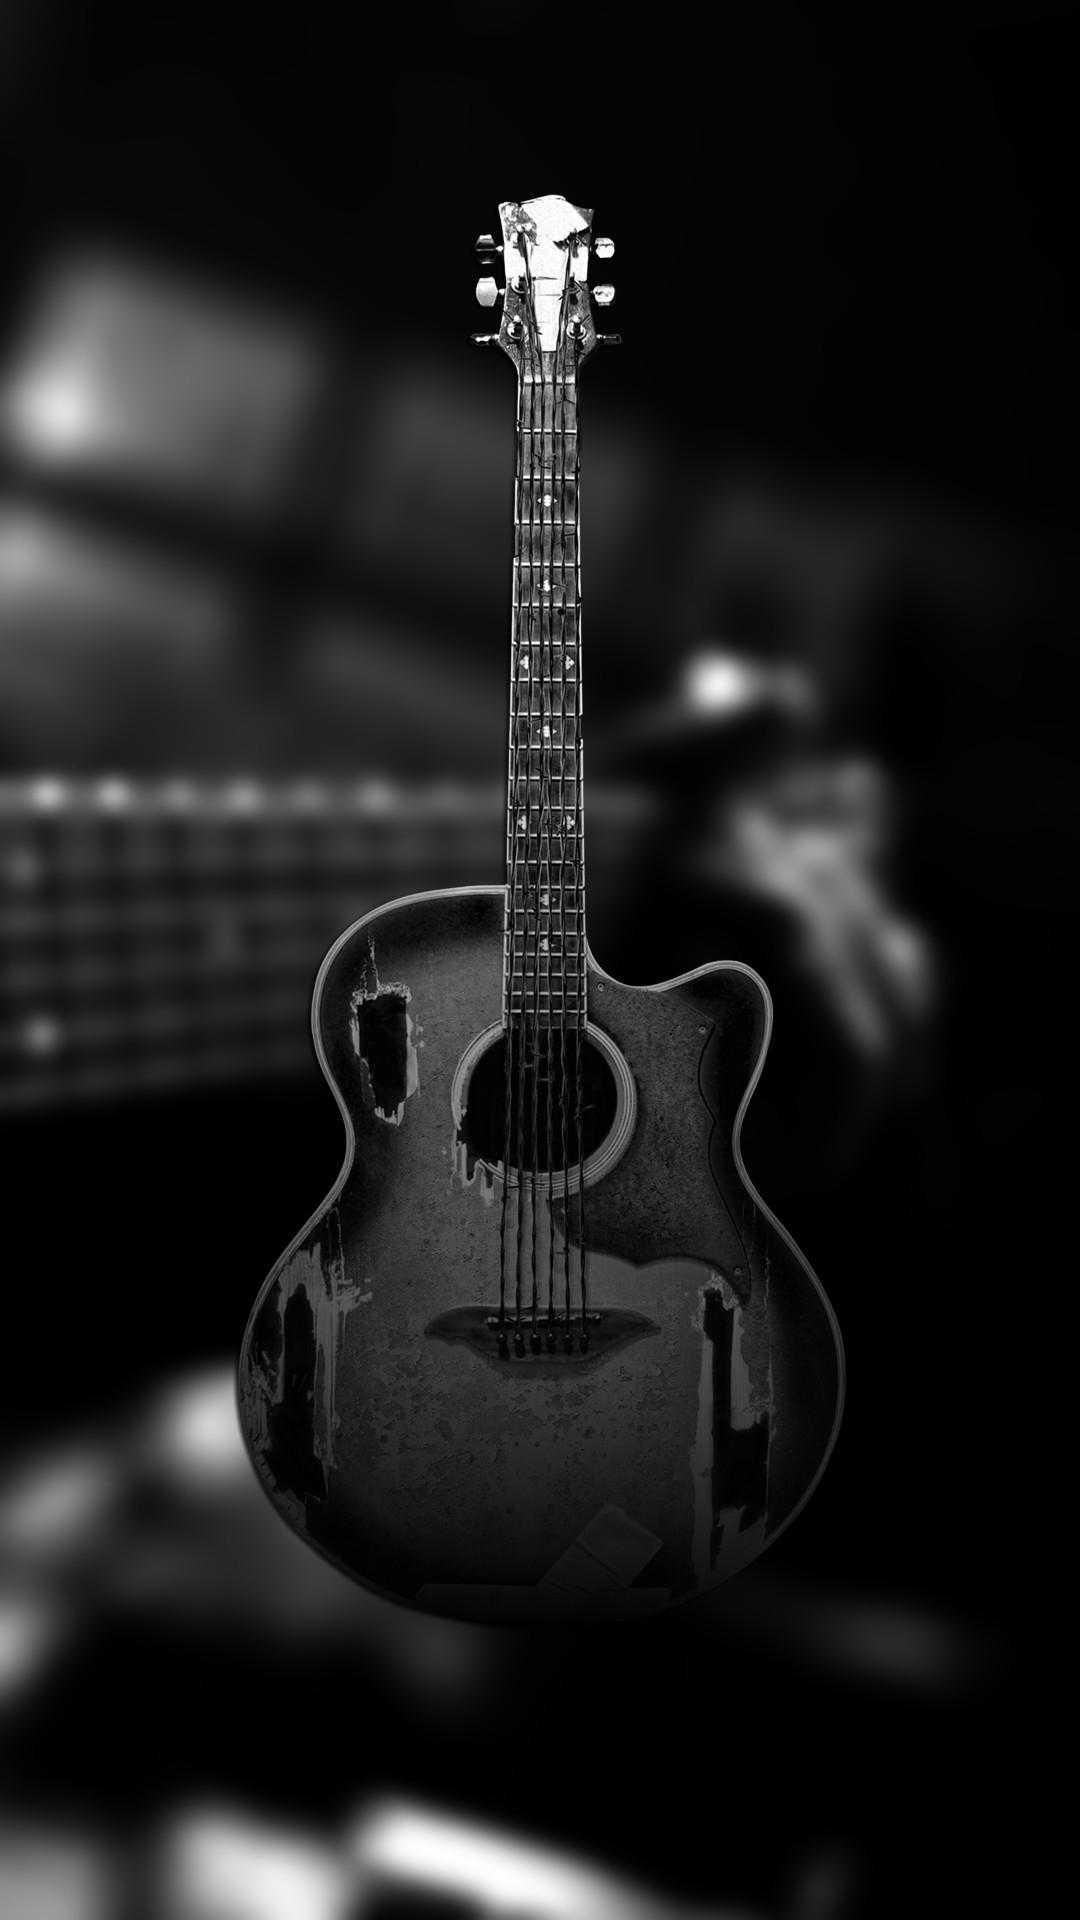 Martin Guitar Desktop Wallpaper 72 Images